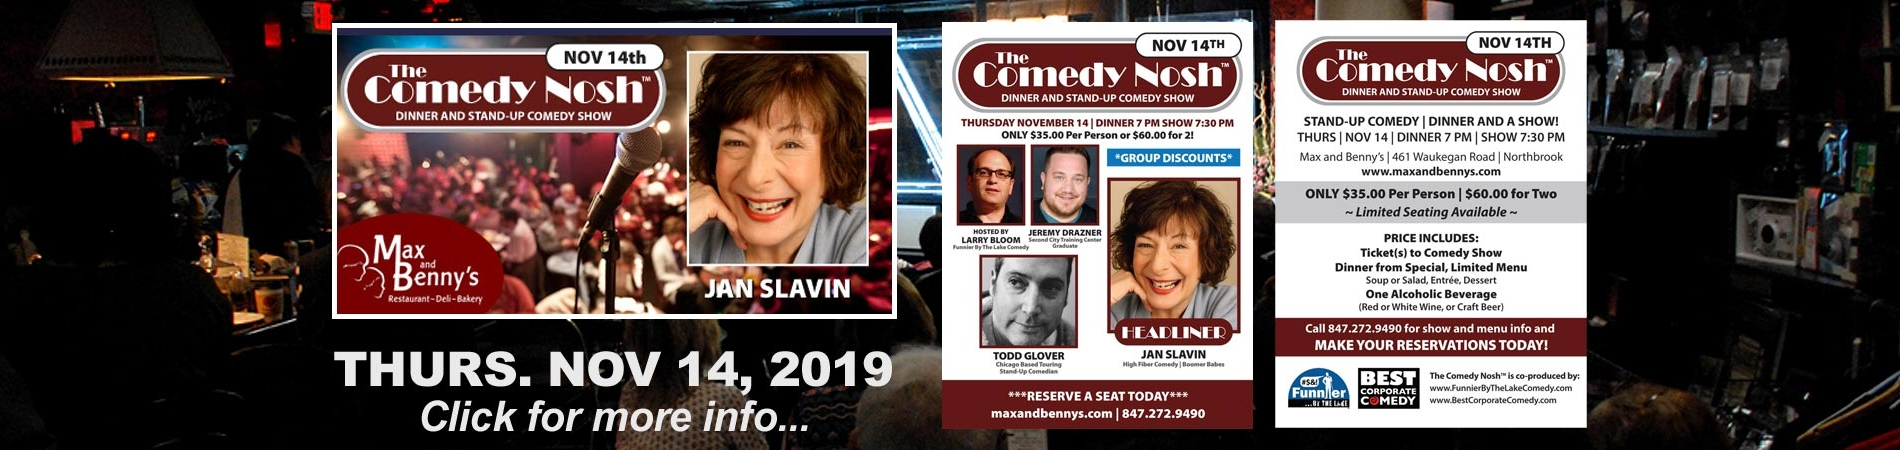 slider-comedynosh-11-2019